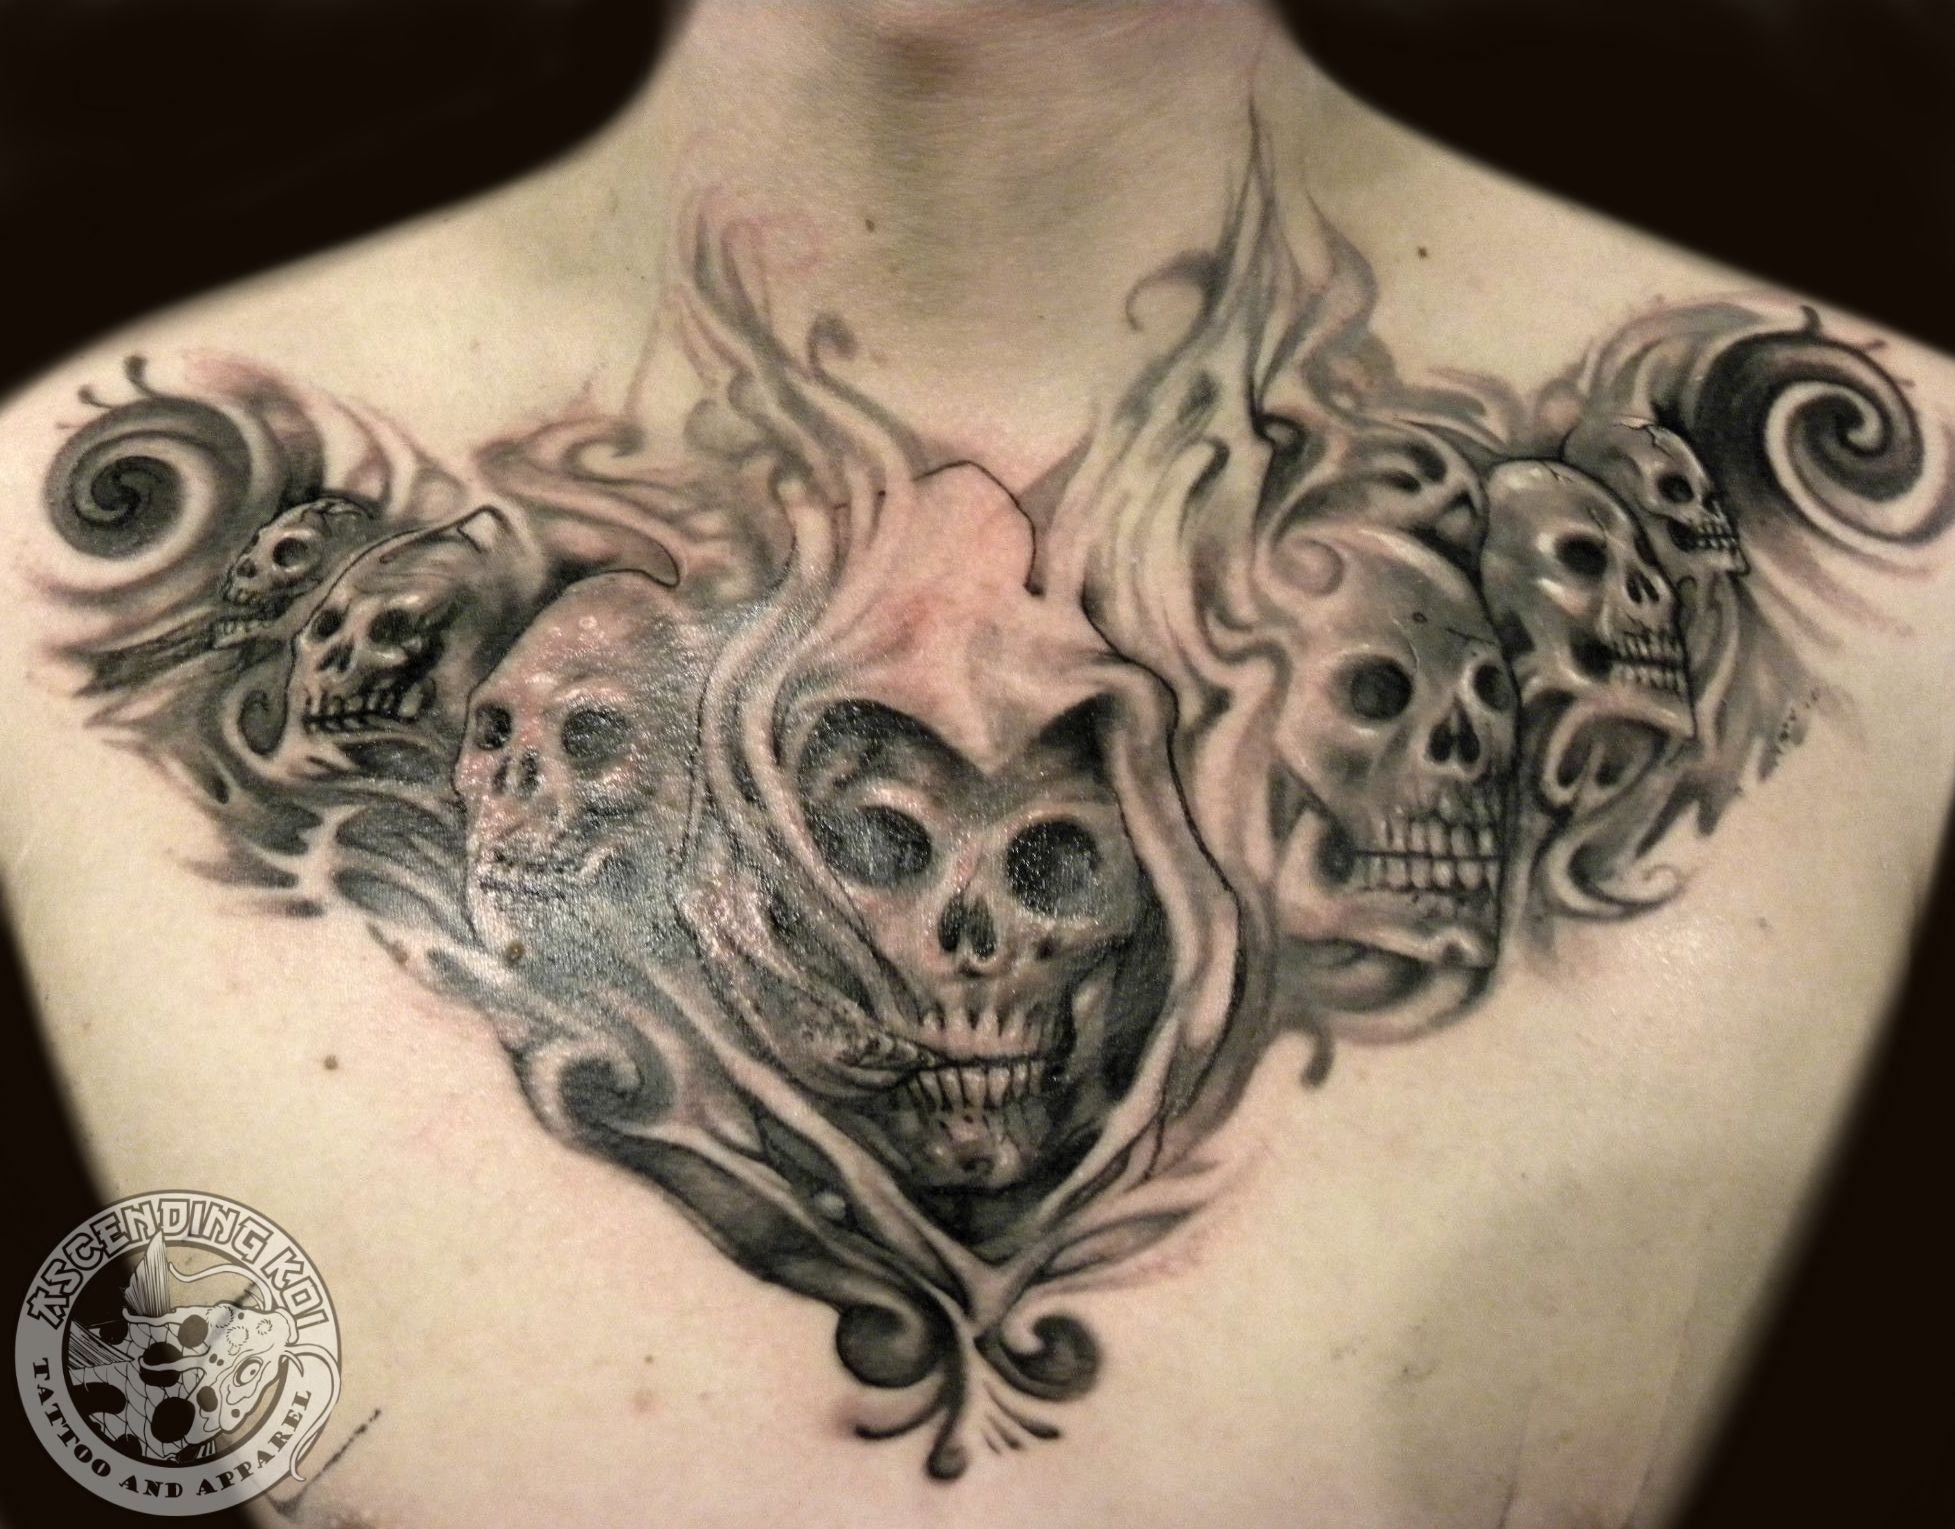 Full Chest Tattoos Skull: Smokey Skull Chest Piece Done By Trevor Jameus